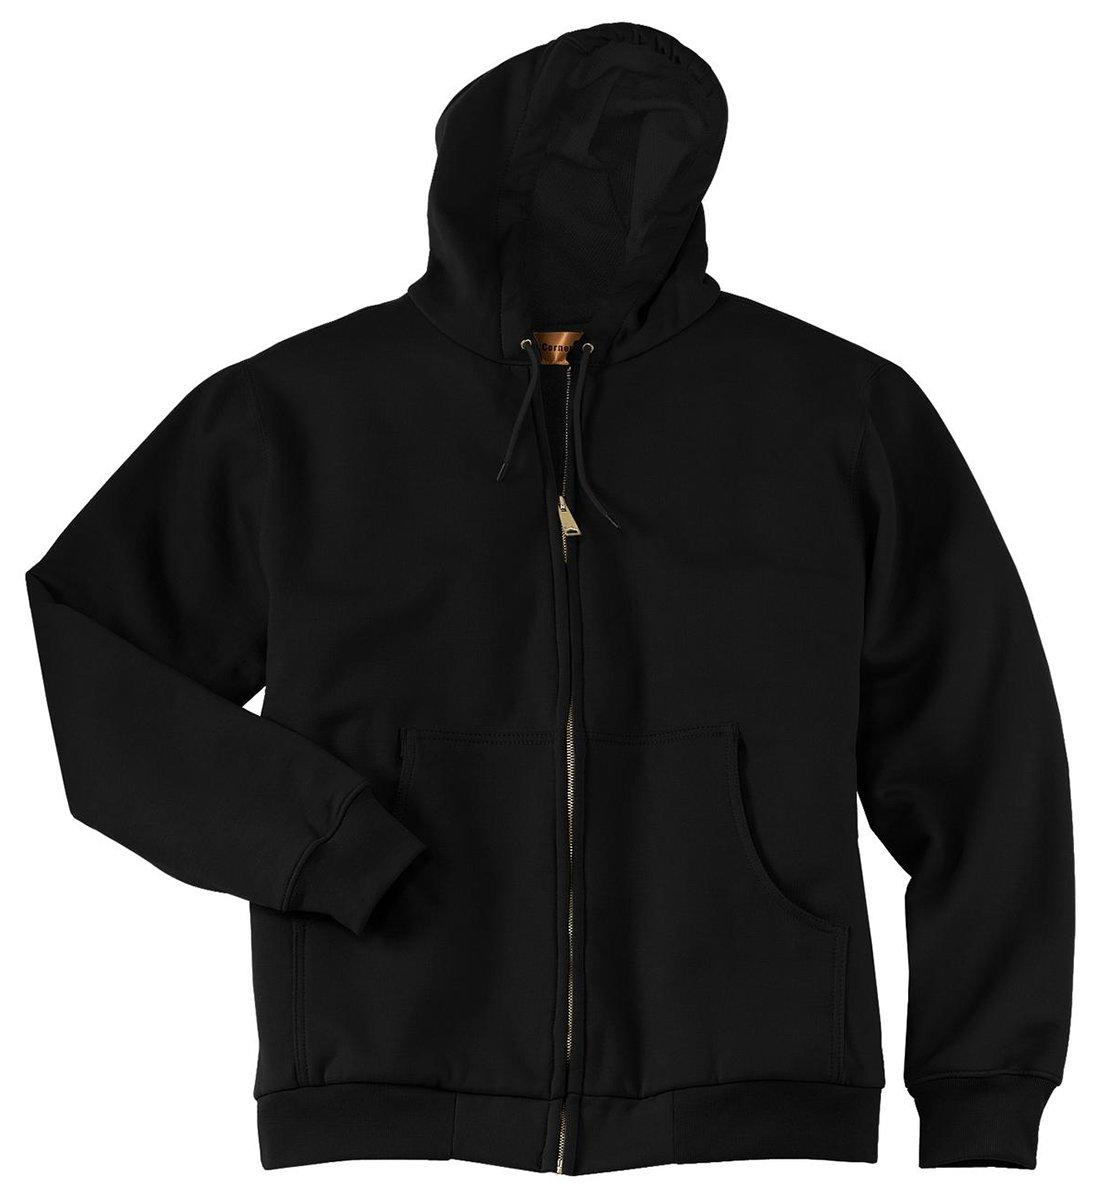 CornerStone - Heavyweight Full Zip Hooded Sweatshirt with Thermal Lining. CS620 - XXXXX-Large - Black